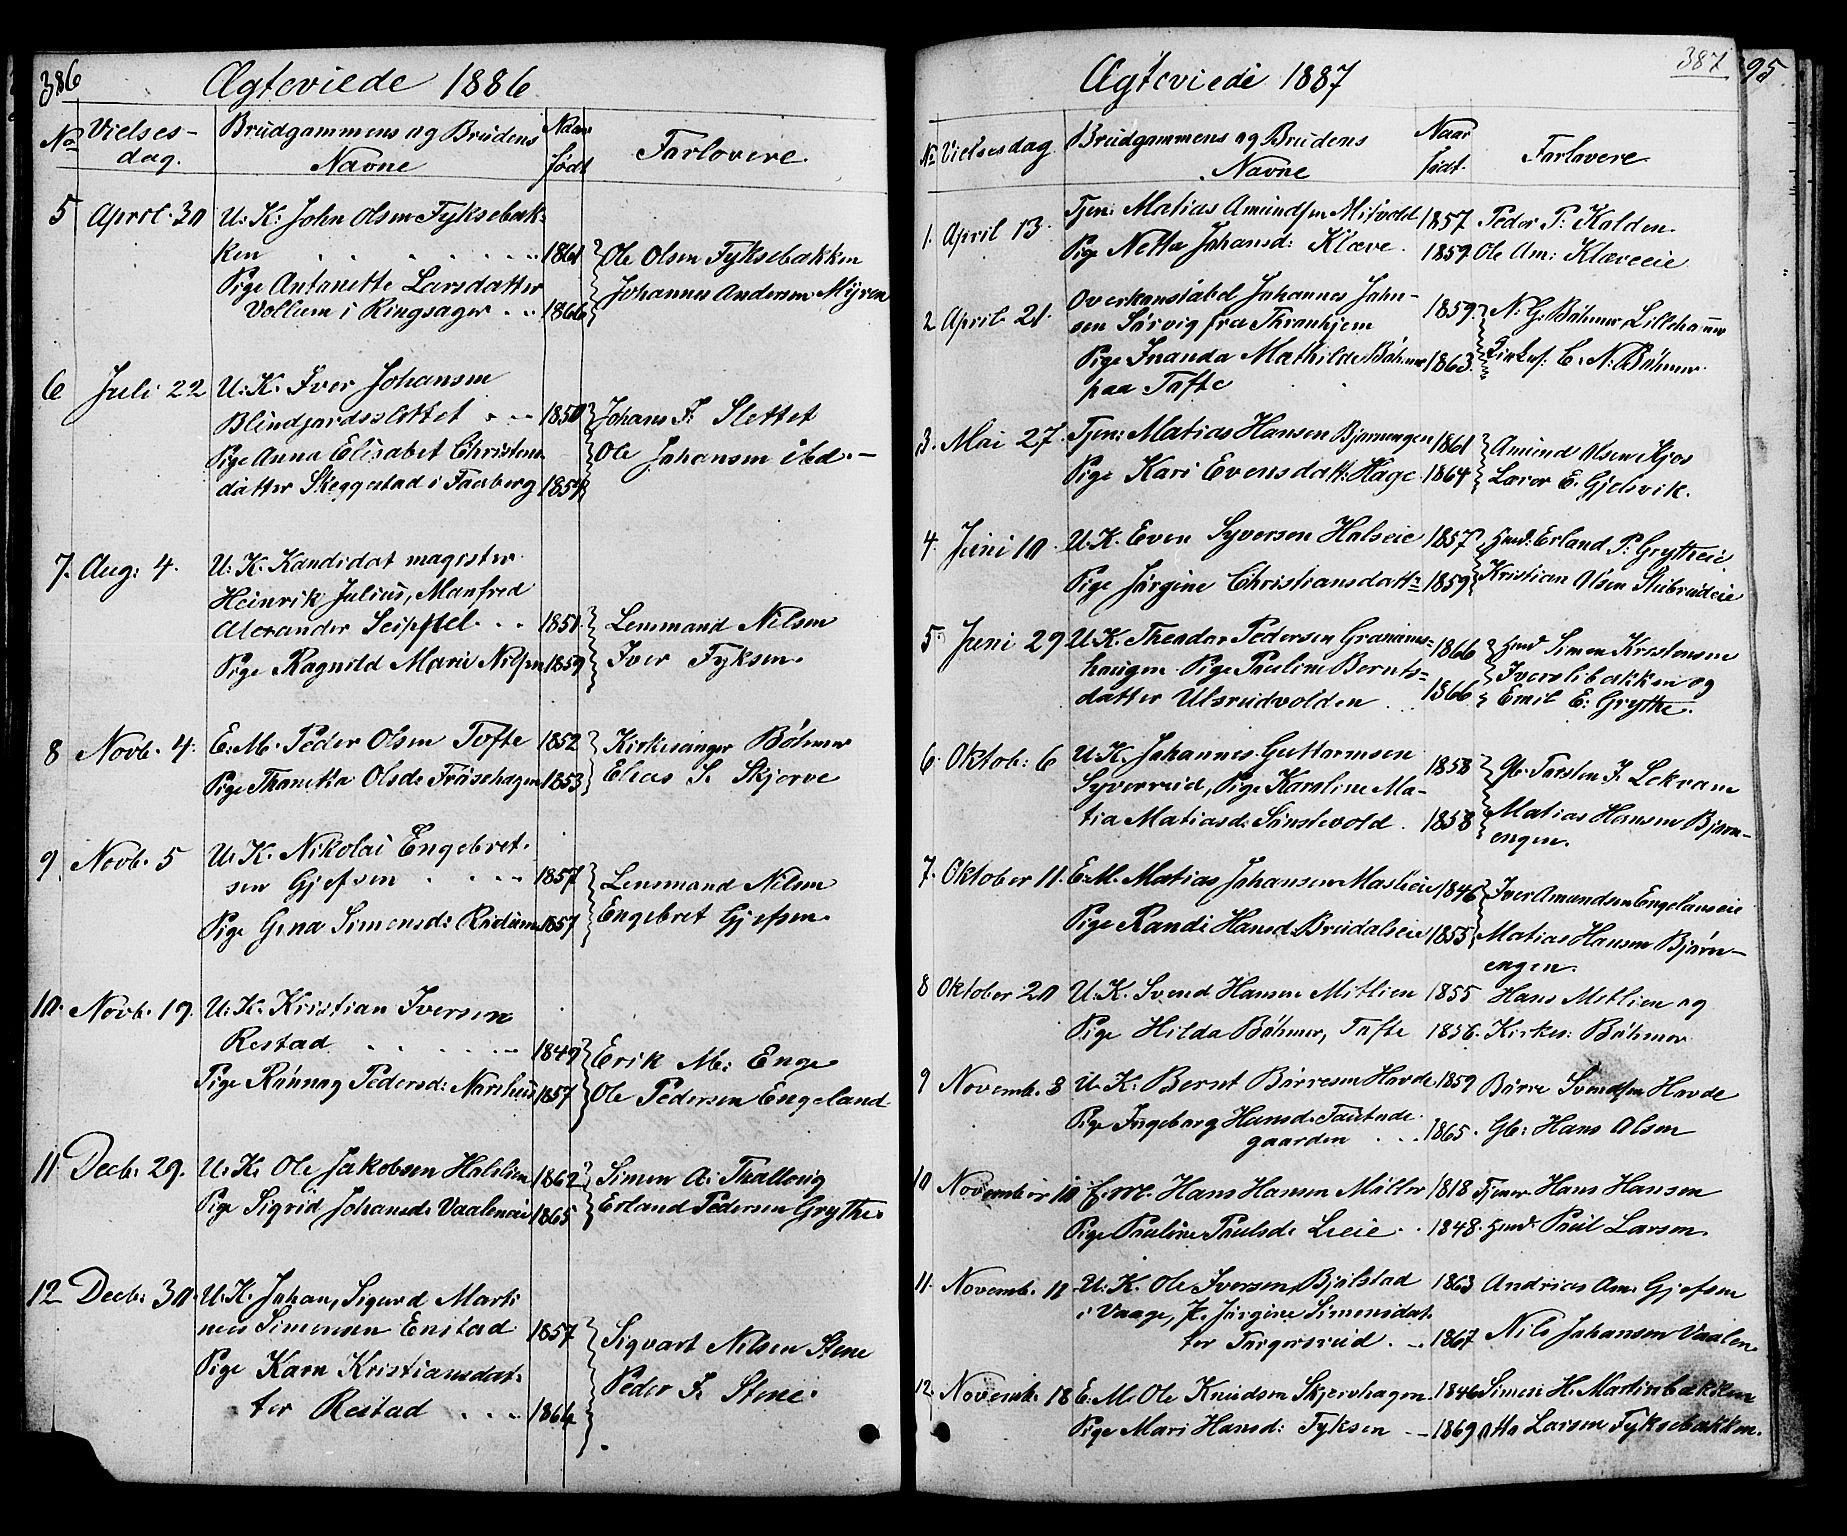 SAH, Østre Gausdal prestekontor, Klokkerbok nr. 1, 1863-1893, s. 386-387